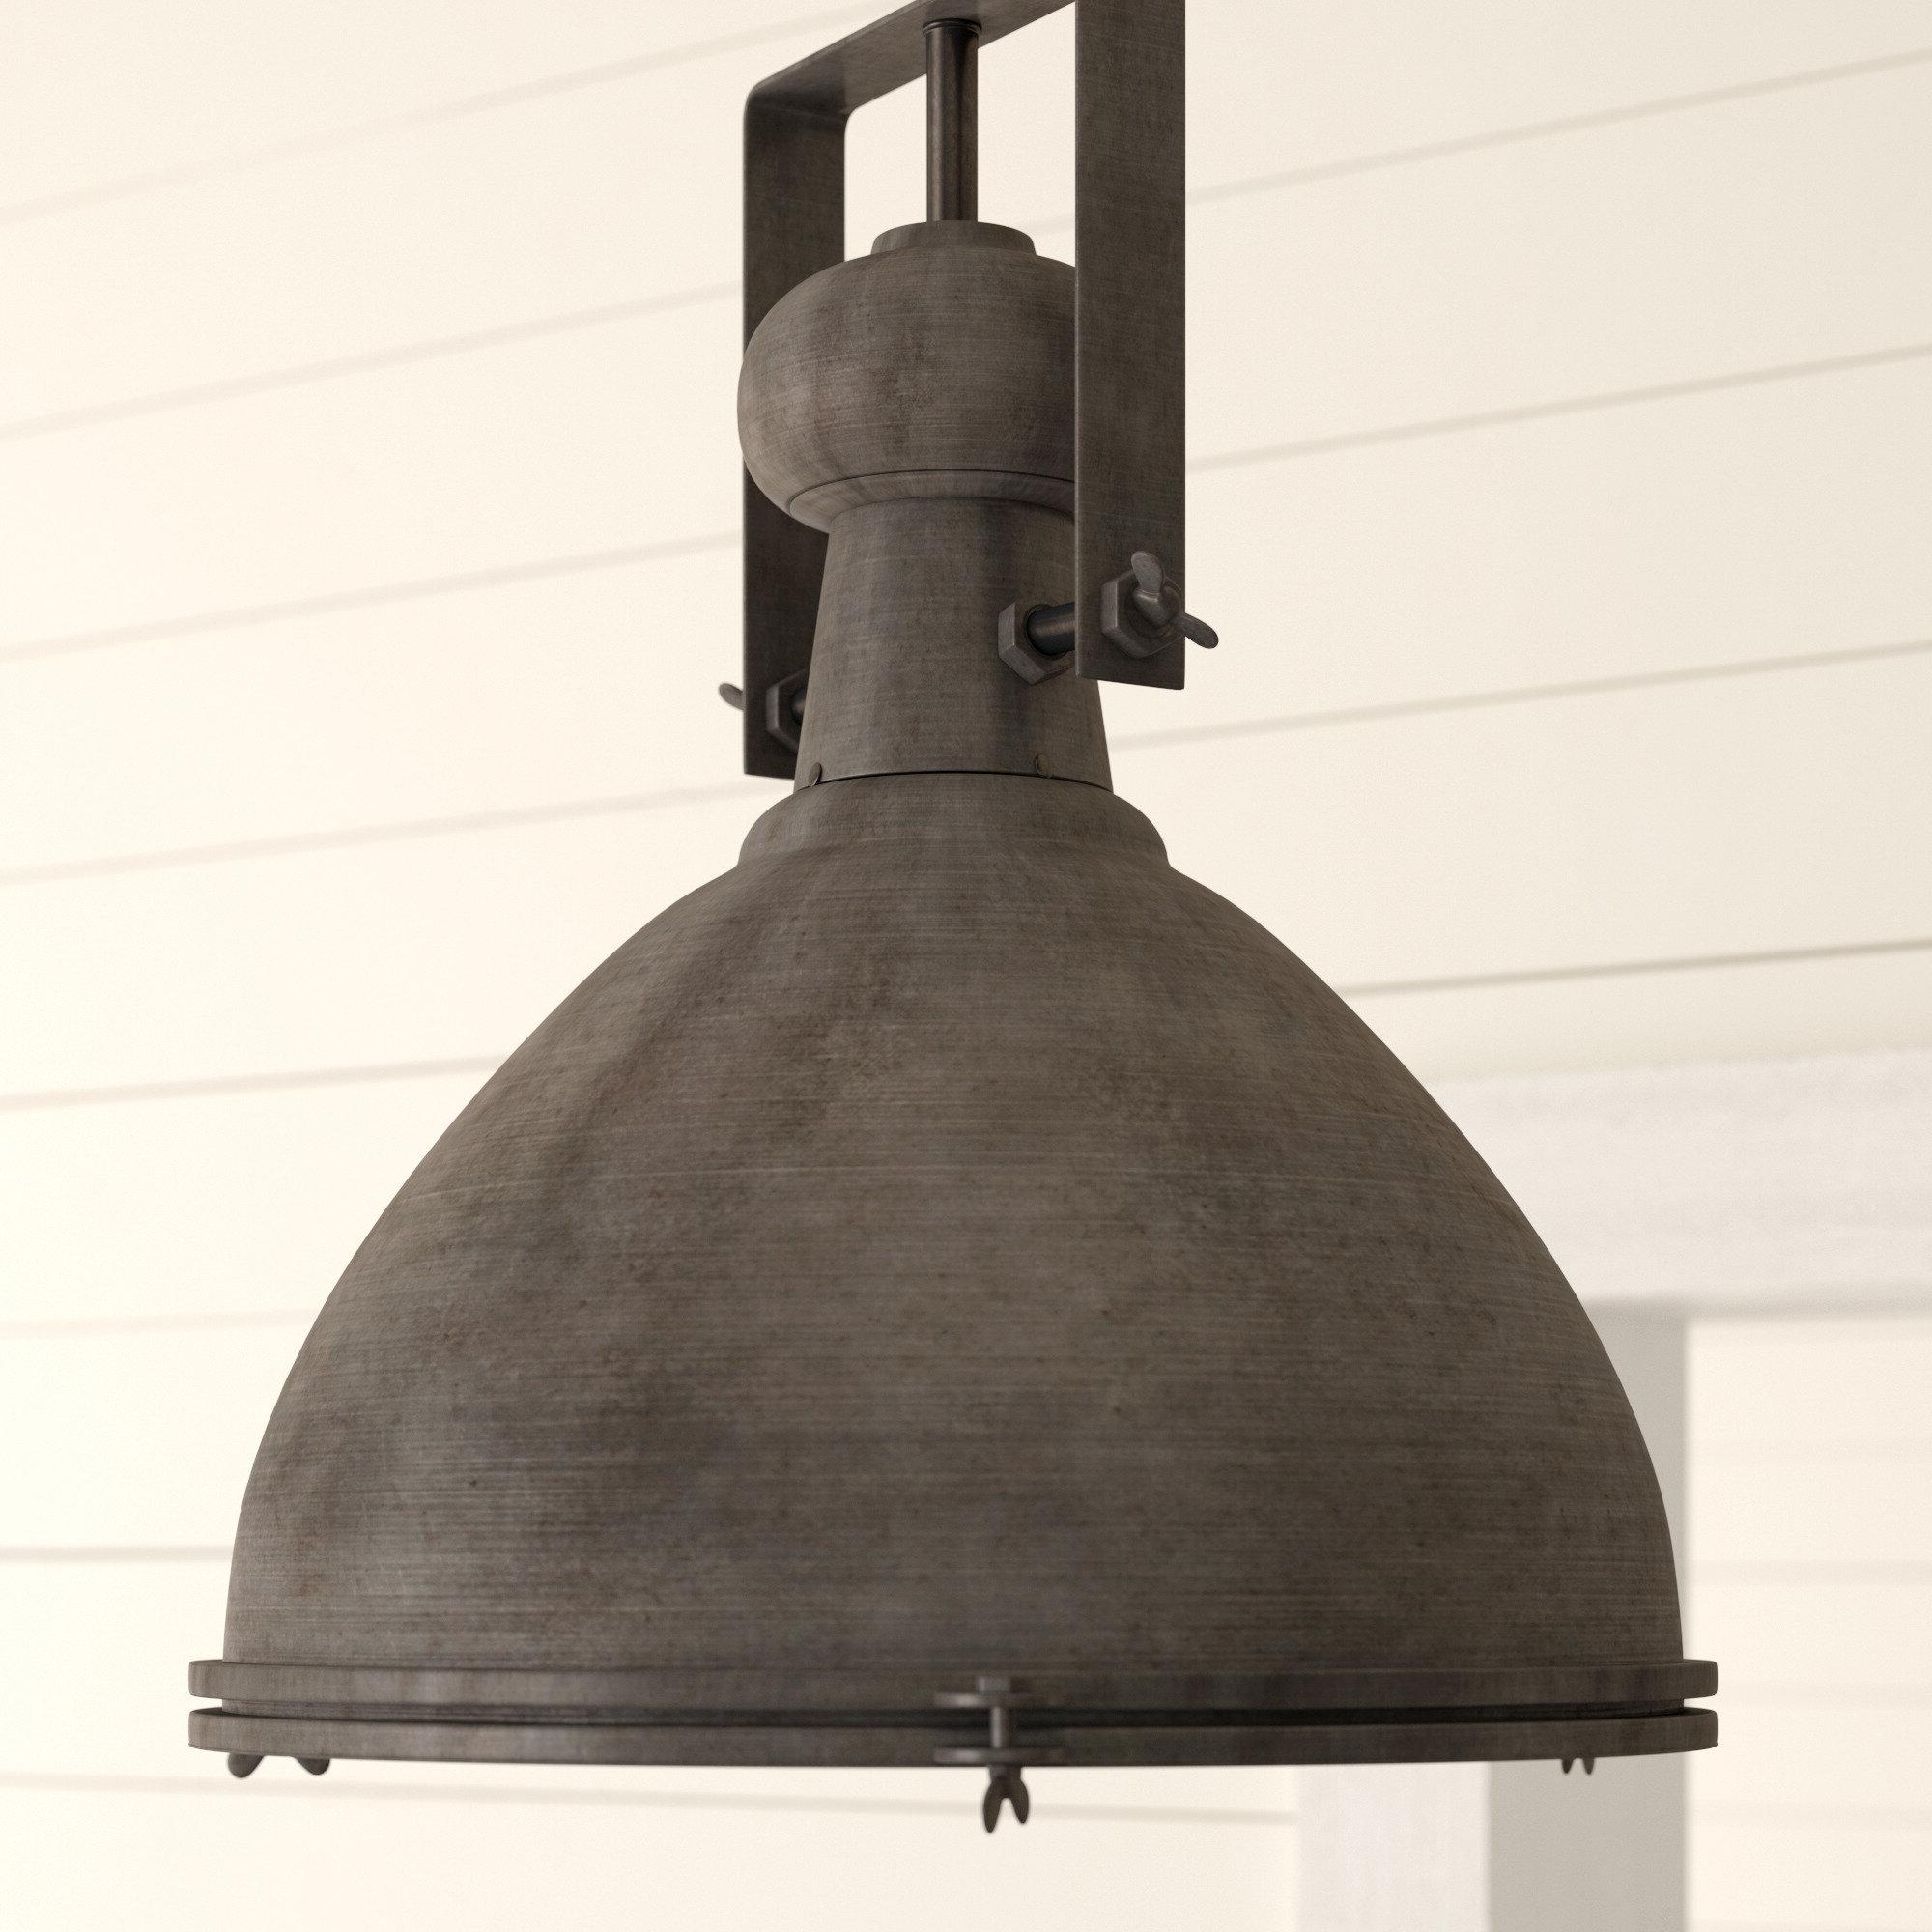 Fashionable Lavern 1 Light Single Dome Pendant For Monadnock 1 Light Single Dome Pendants (Gallery 6 of 20)